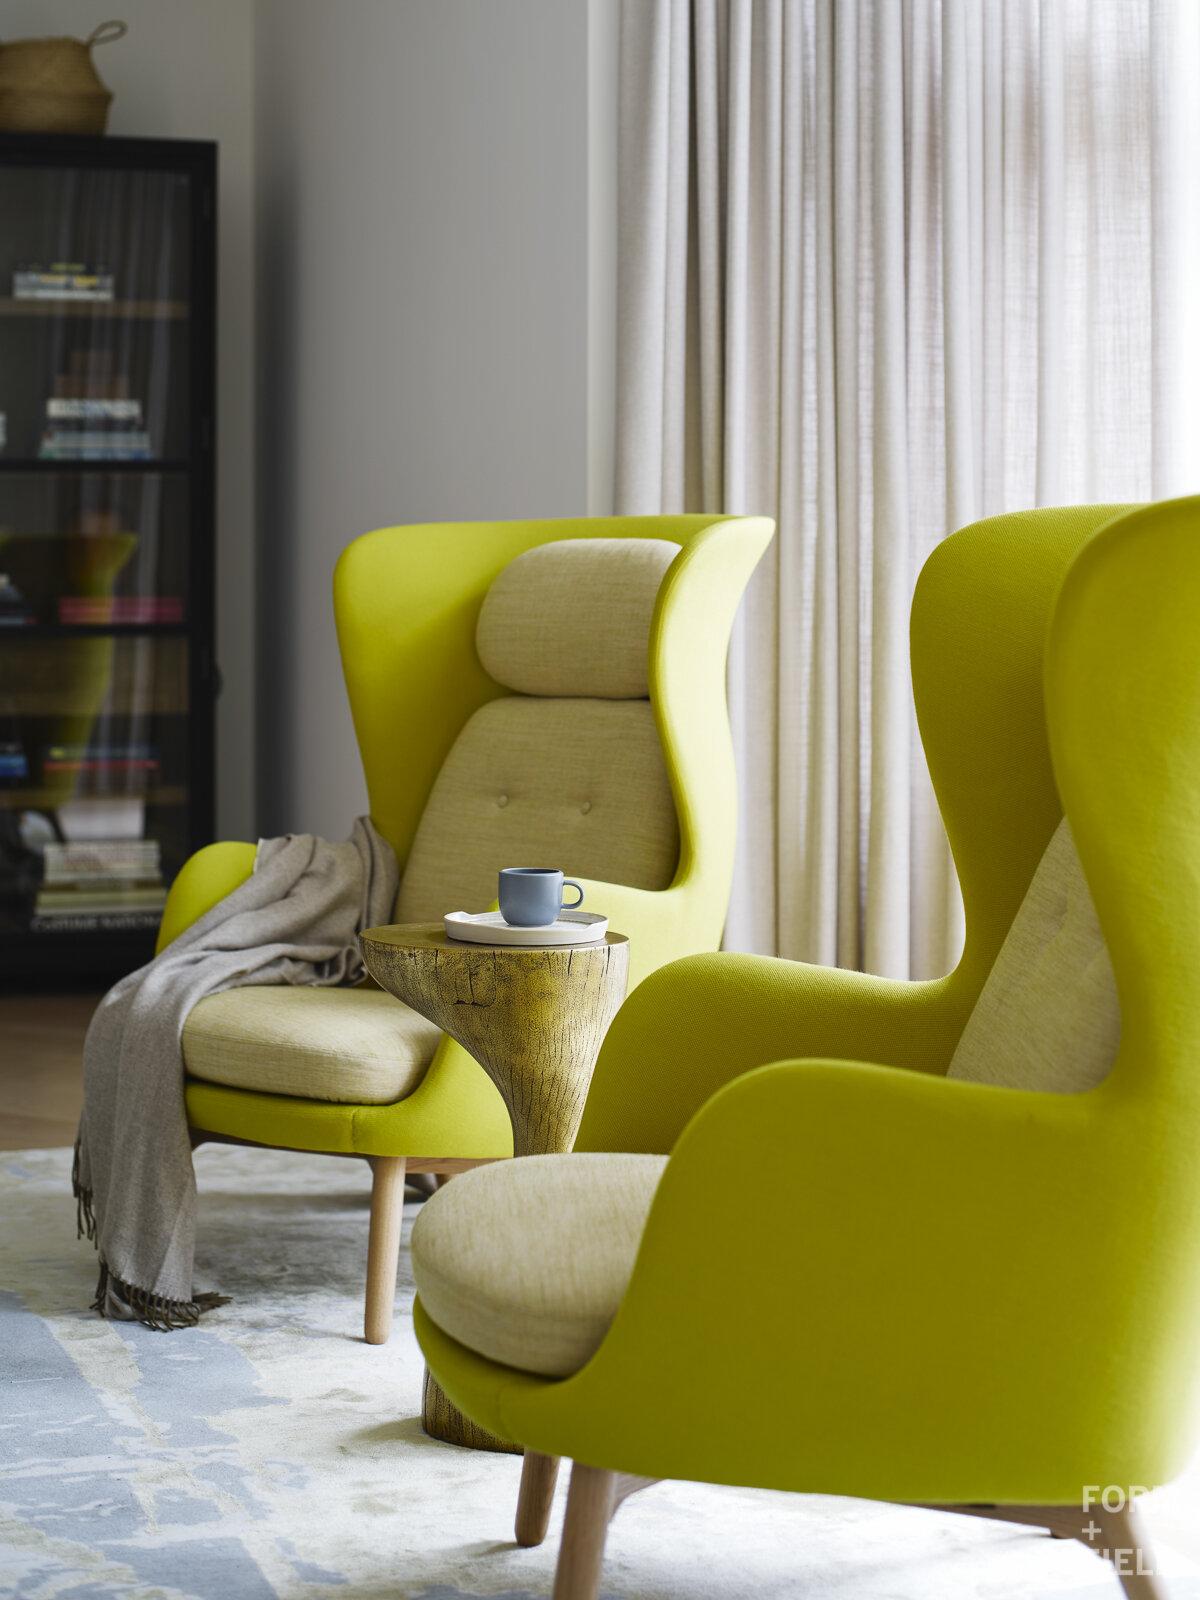 Atherton Estate Family Room Lounge Chair Detail